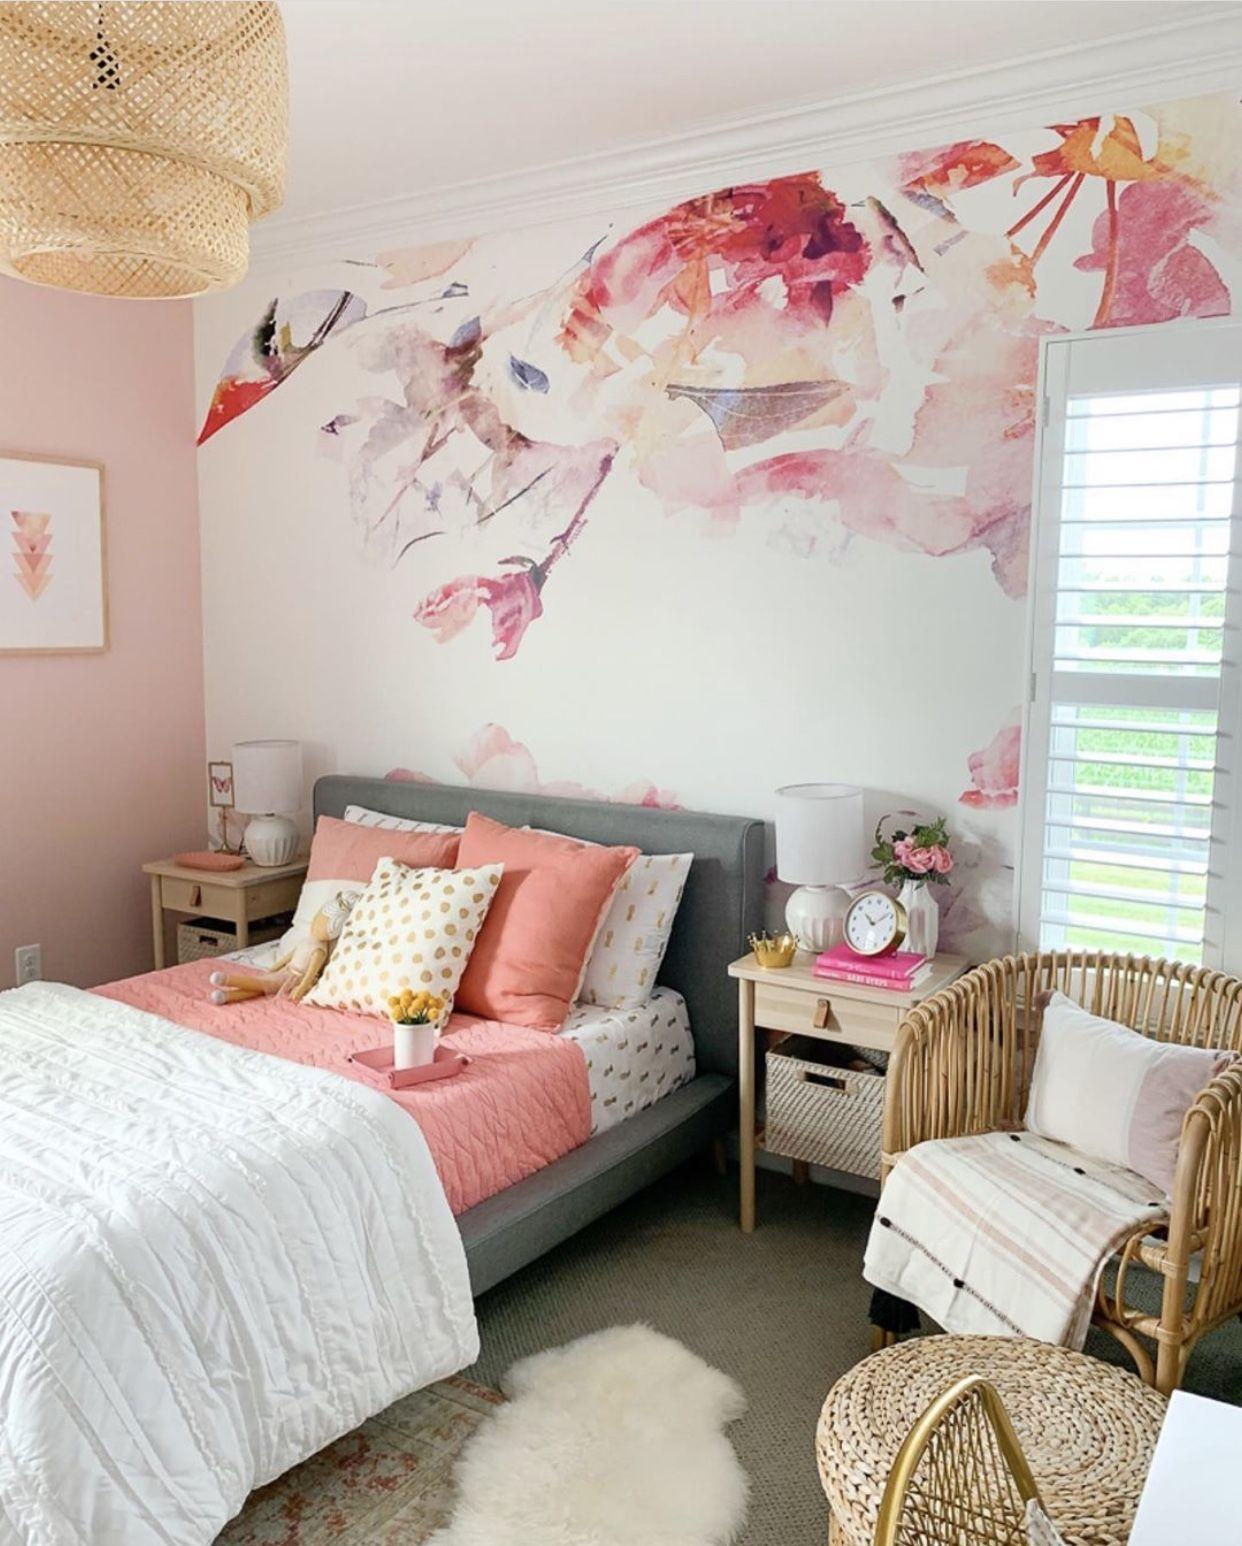 Spring Floral Mural Bedroom Decor Room Ideas Bedroom Boho Chic Bedroom